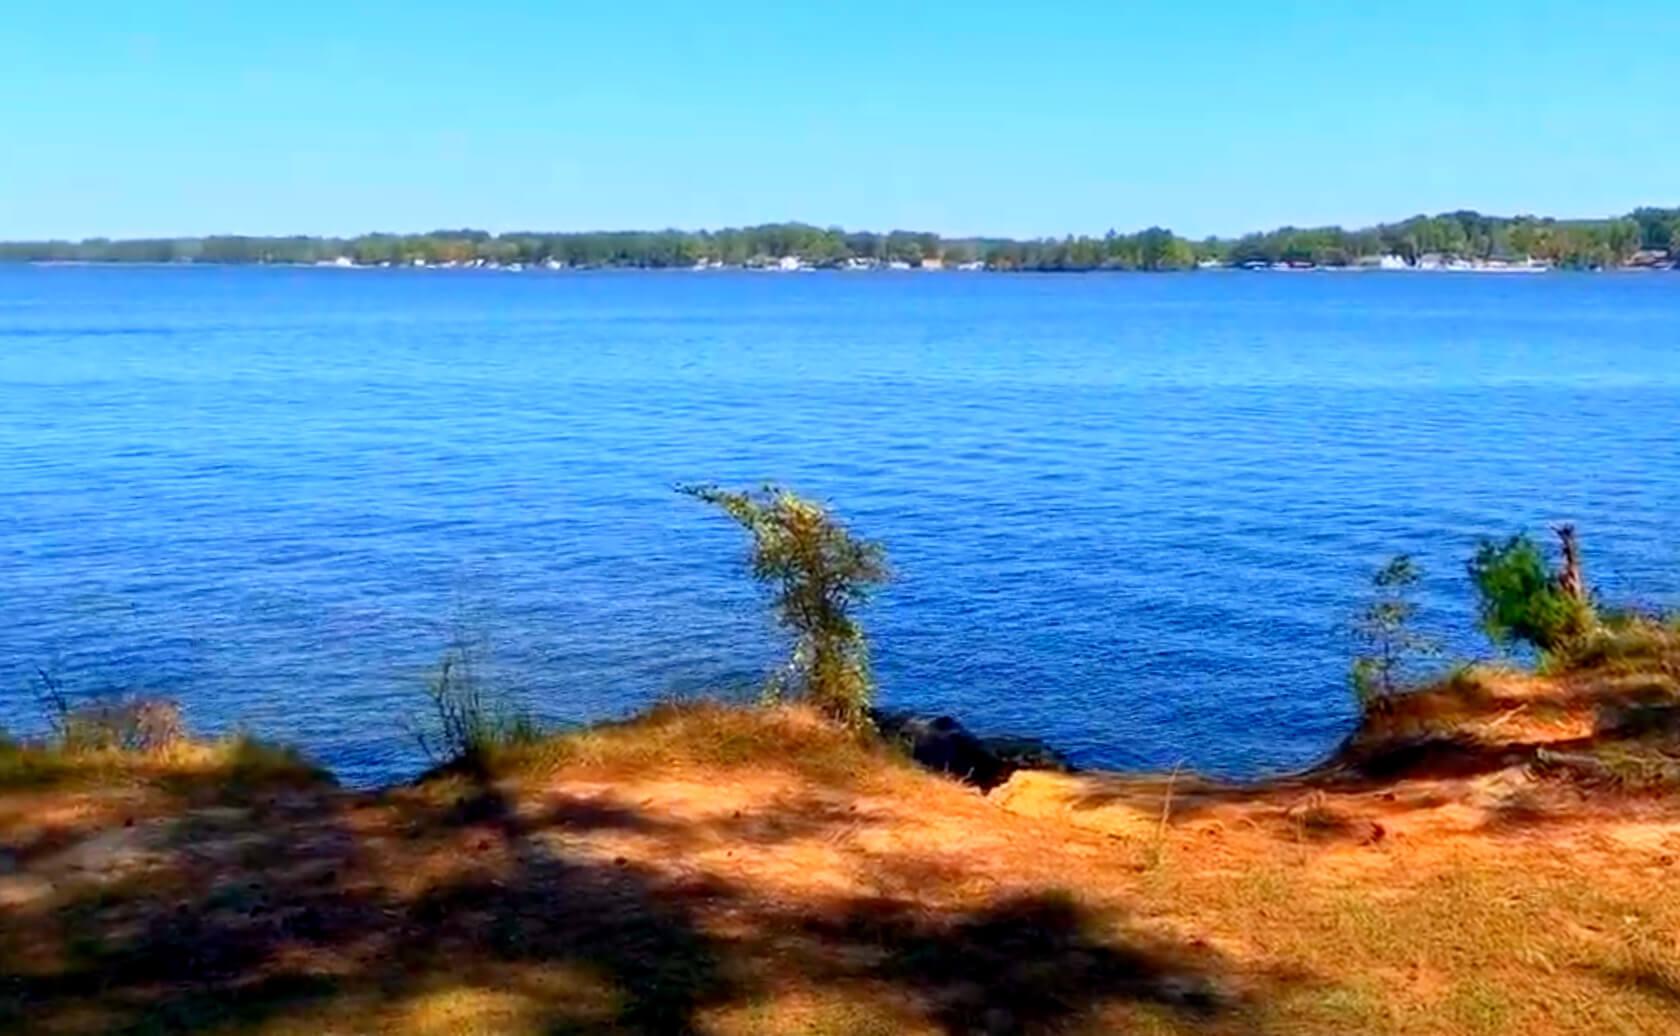 Greenwood-Lake-Fishing-Guide-Report-South-Carolina-04